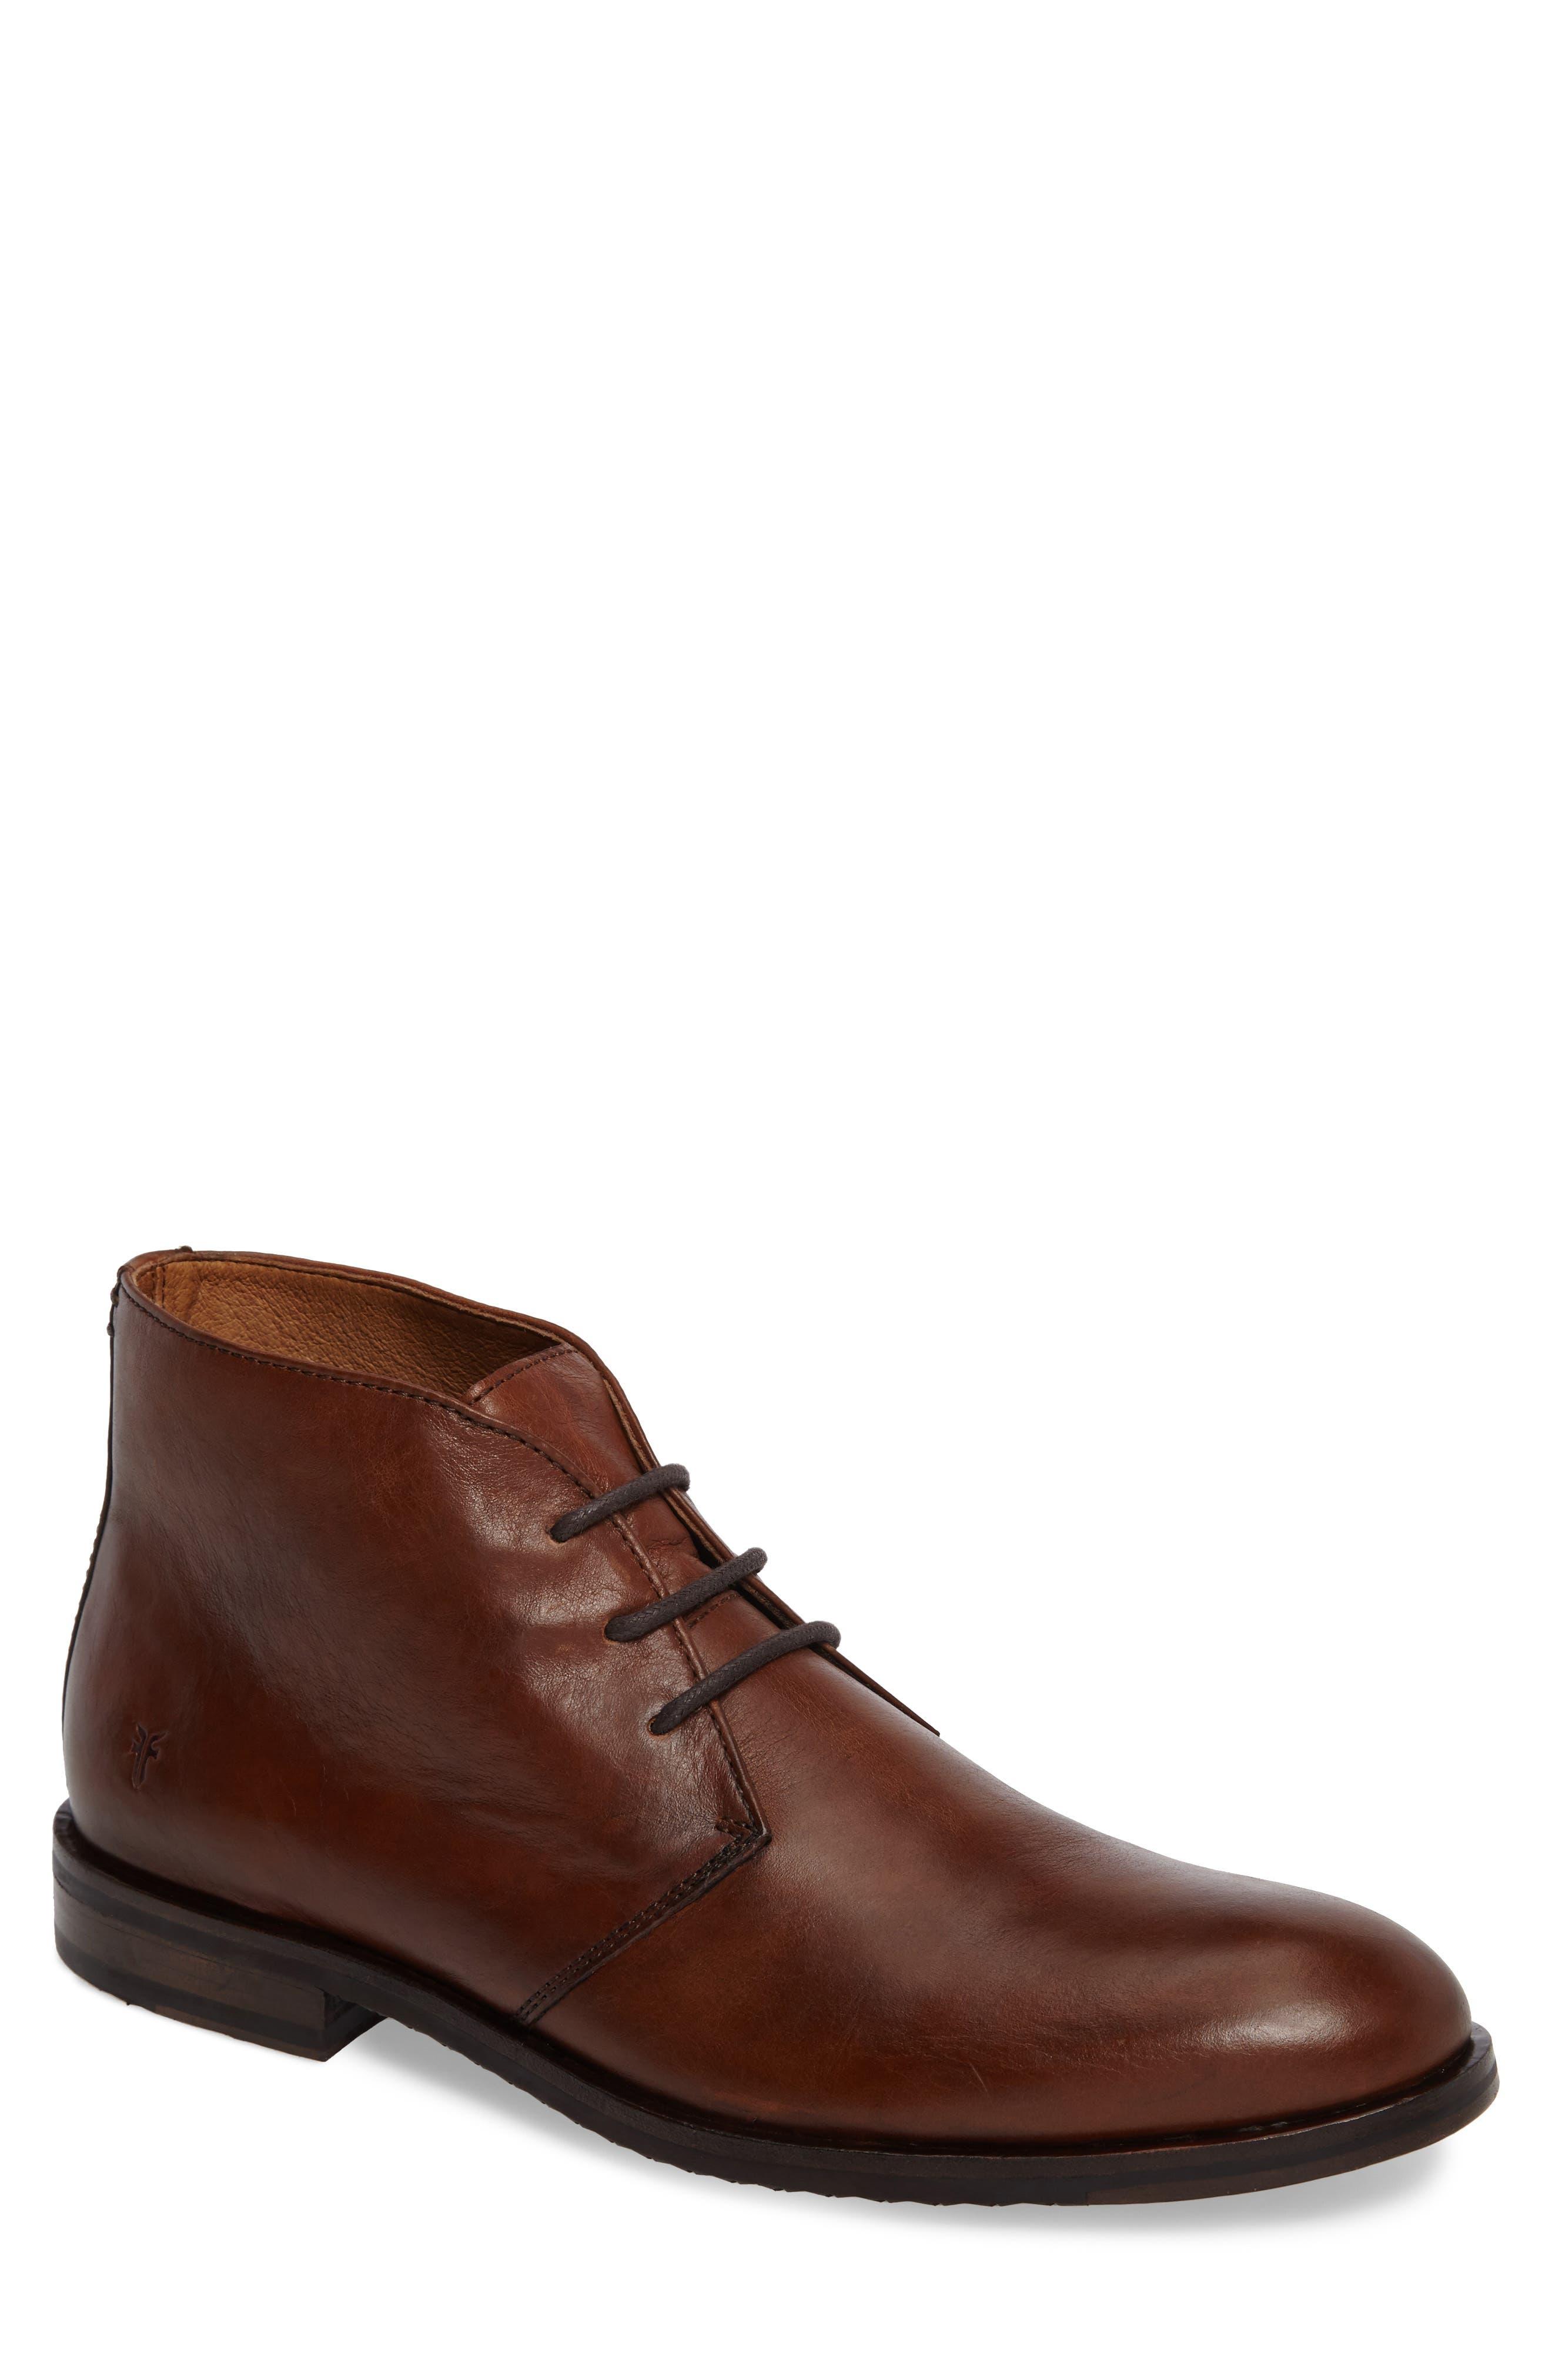 Sam Chukka Boot,                         Main,                         color, Cognac Leather